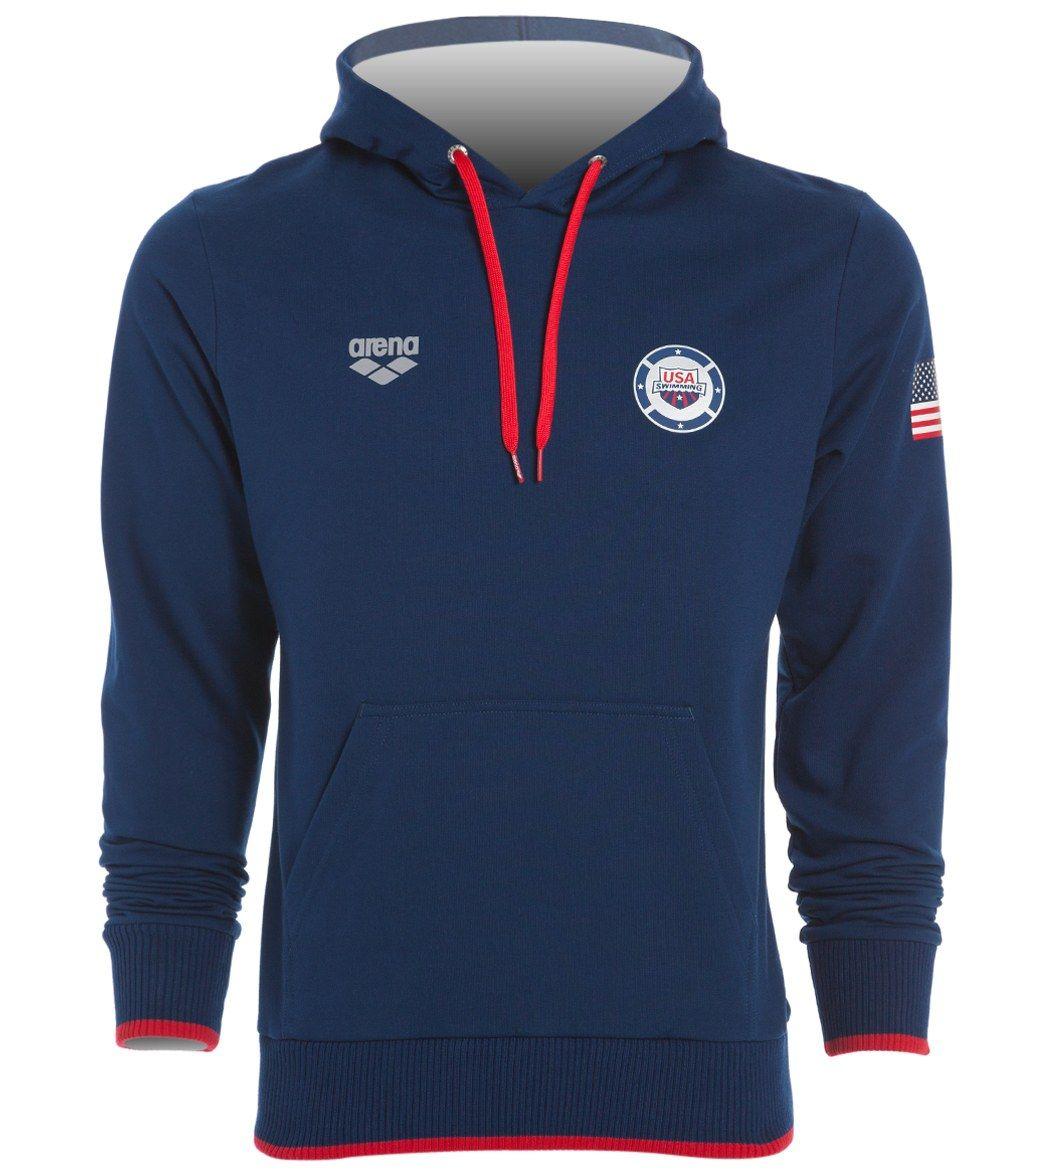 Arena USA Swimming Hooded Sweatshirt at The